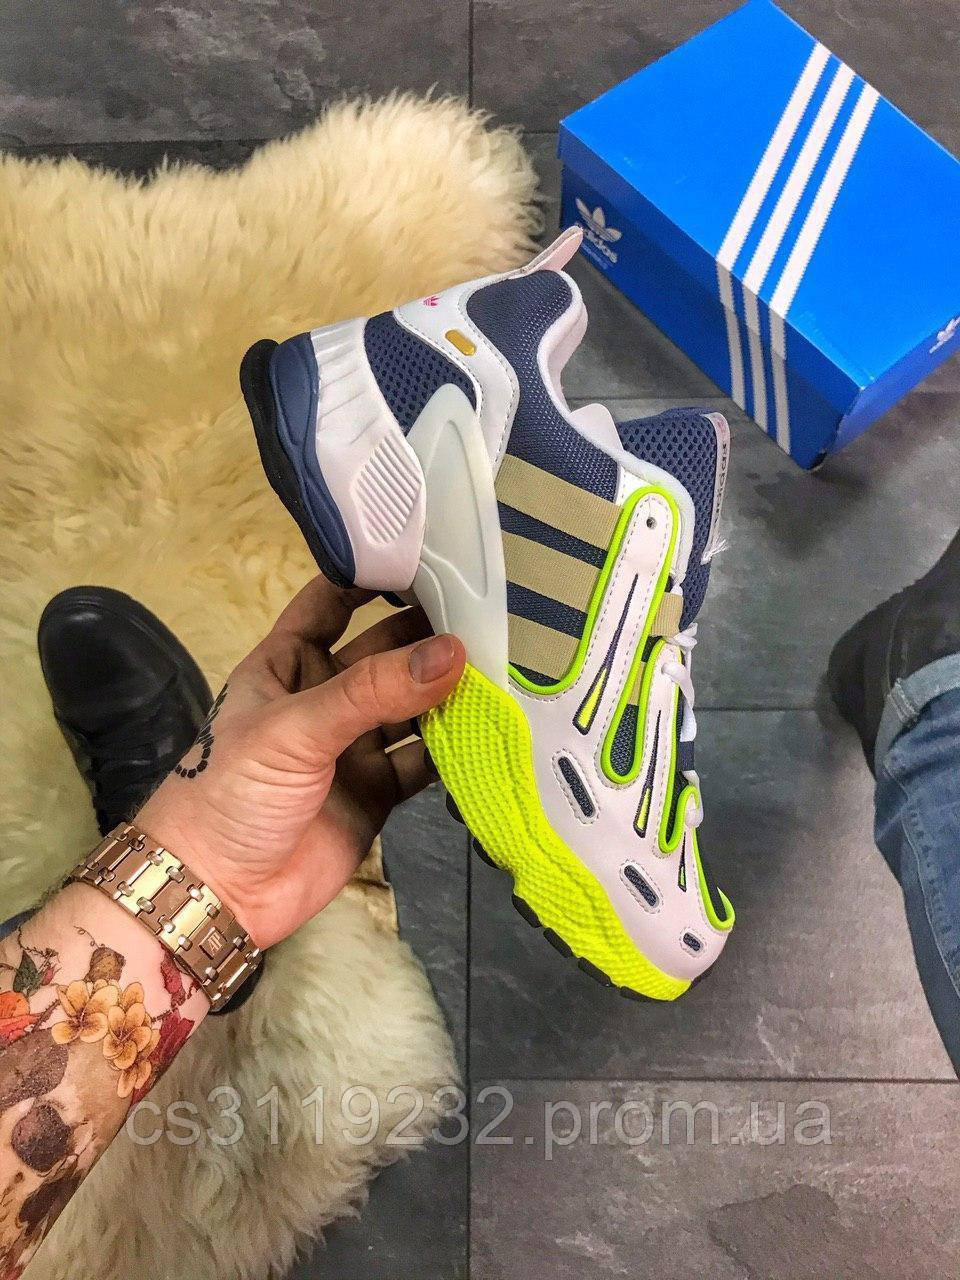 Мужские кроссовки Adidas EQT Gazelle Collegiate Navy White Gold